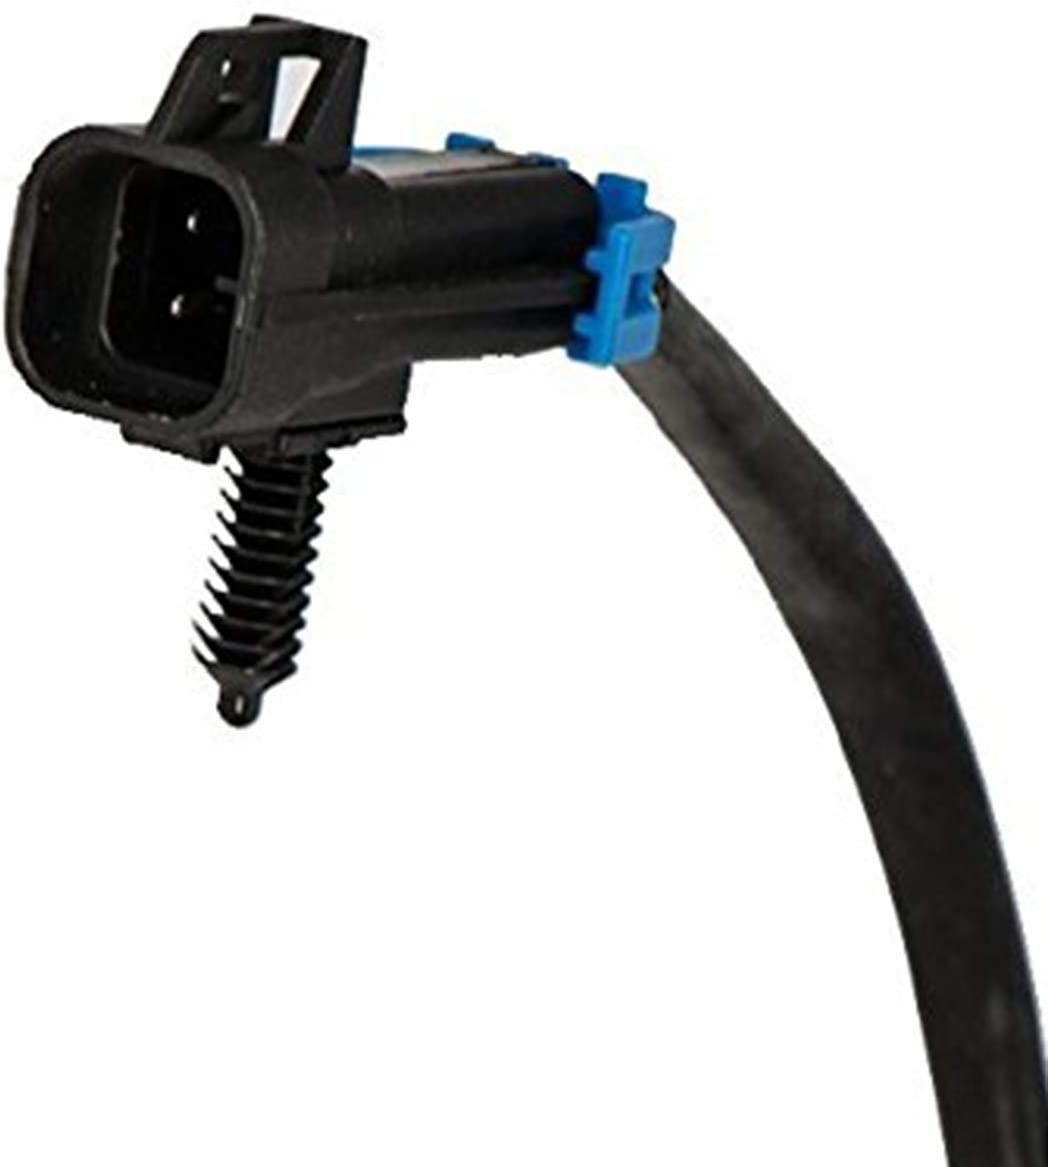 Moligh doll 234-4018 Stromab Sensor 2 Sauerstoff O2 Sensor F/ür Chevy C2500 K1500 C1500 Express 1500 K2500 Silverado 1500 Express 2500 Gmc C2500 C1500 K1500 Sierra Savana